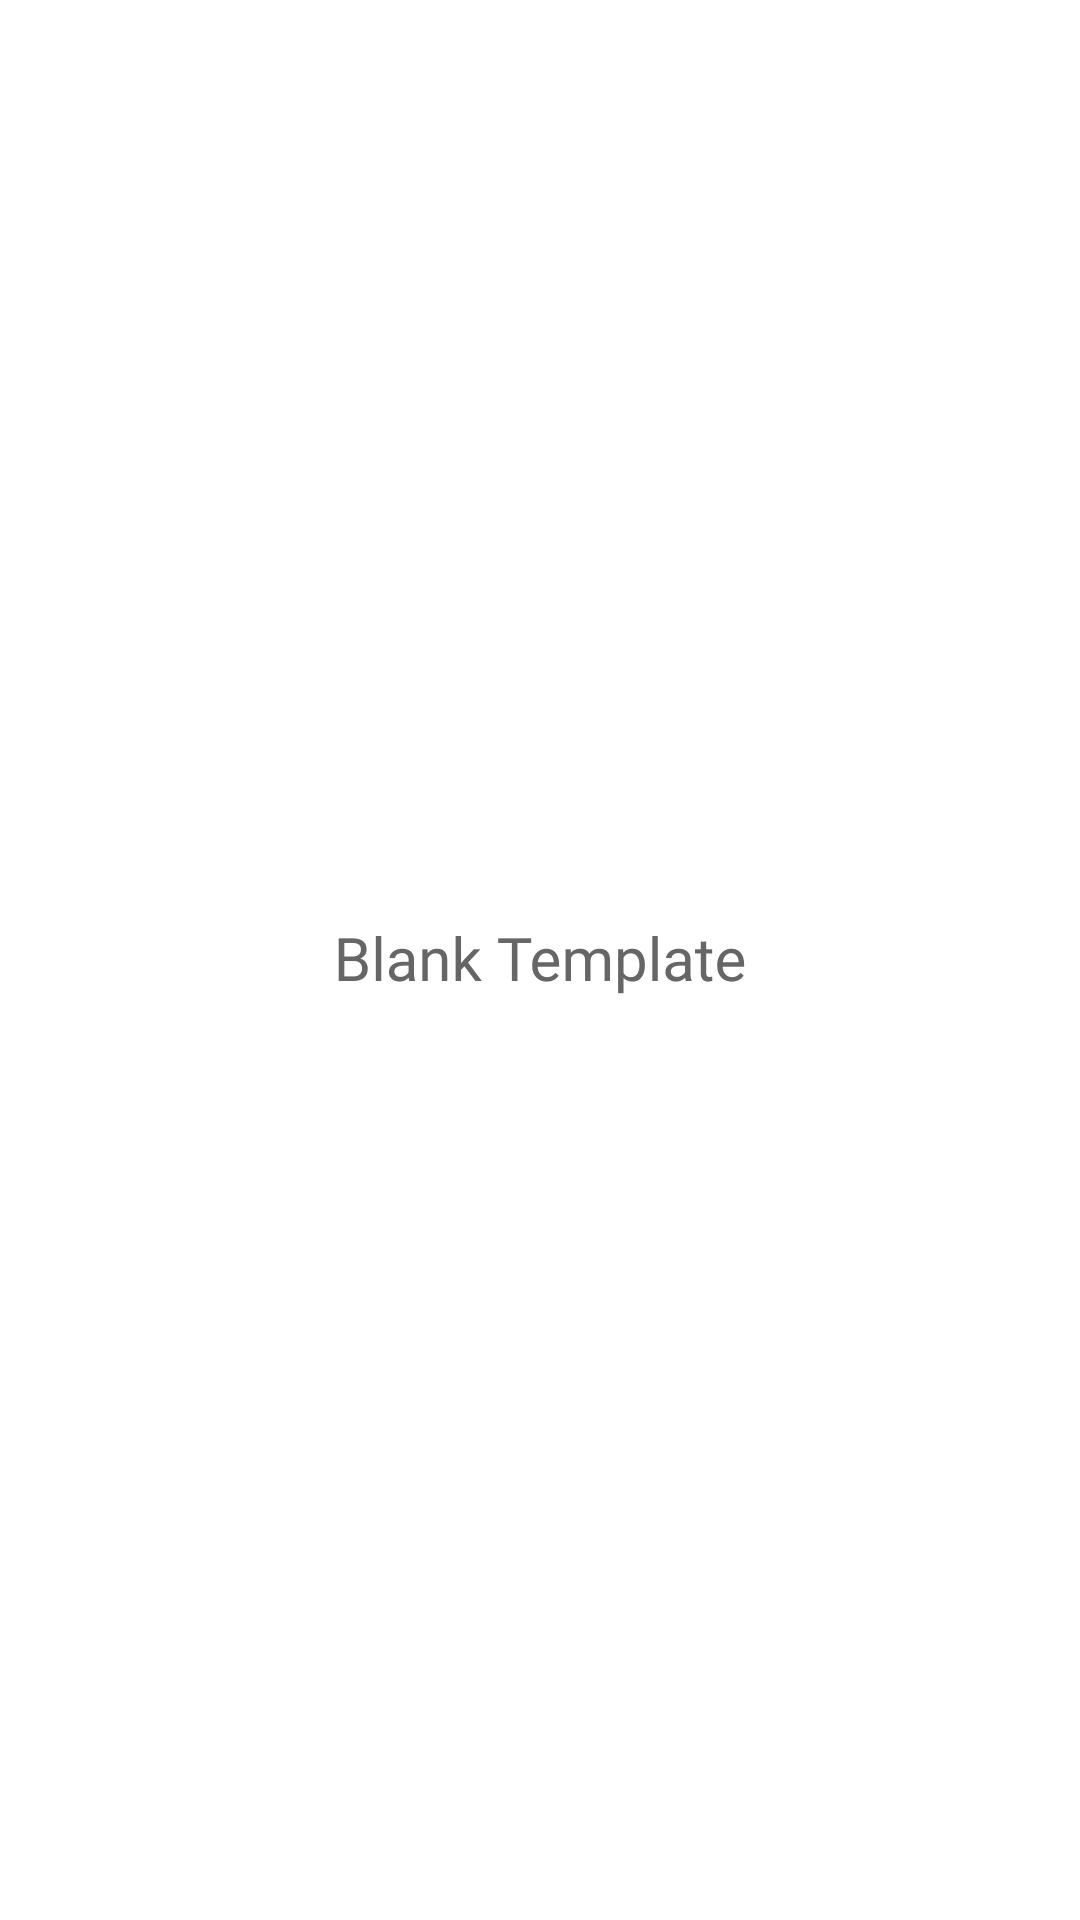 Blank Template Mockups Vertical Template